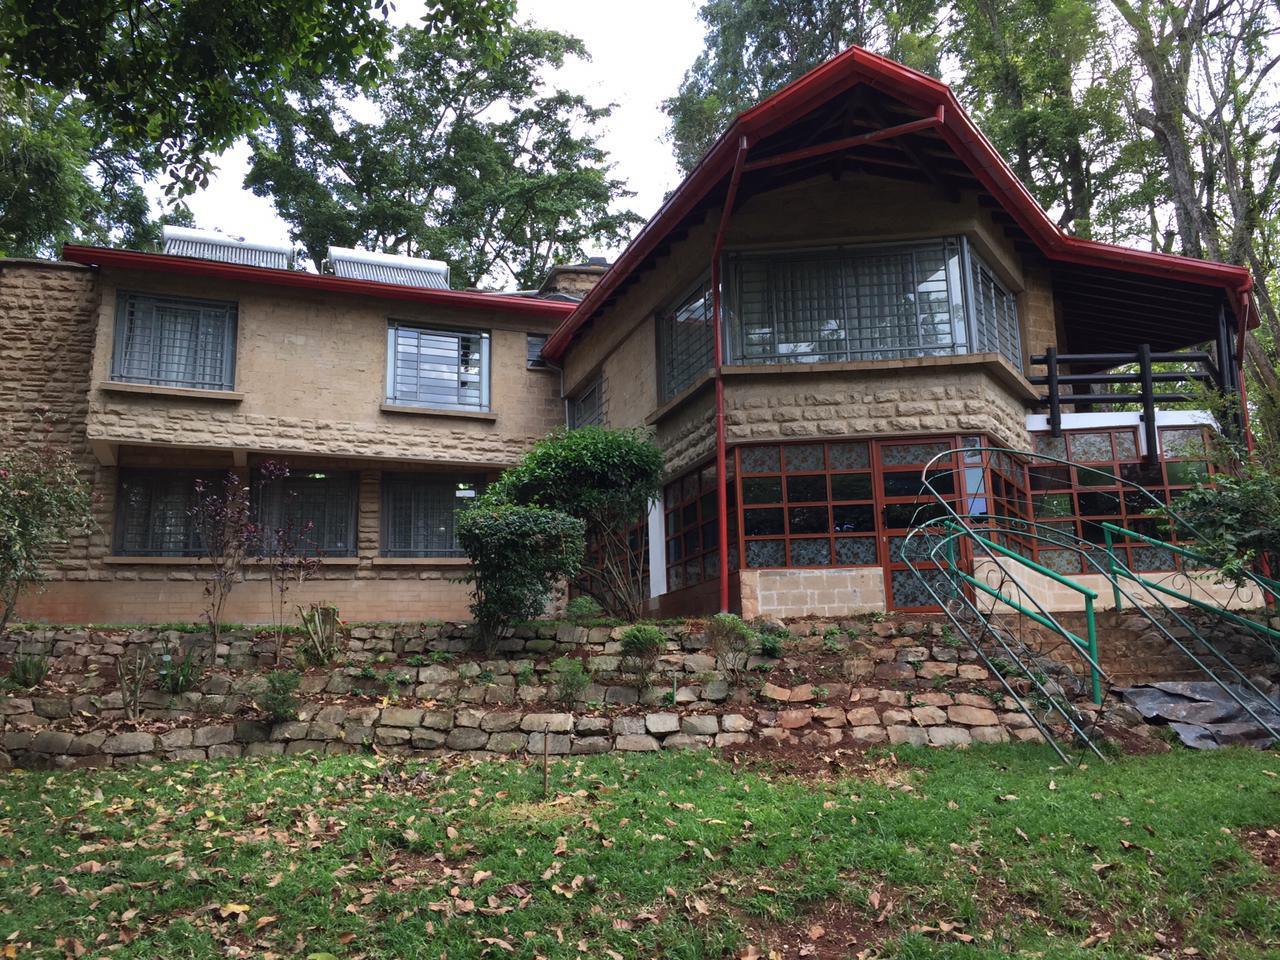 5 Bedrooms House All en-suite on Half an Acre for rent at Ksh400k